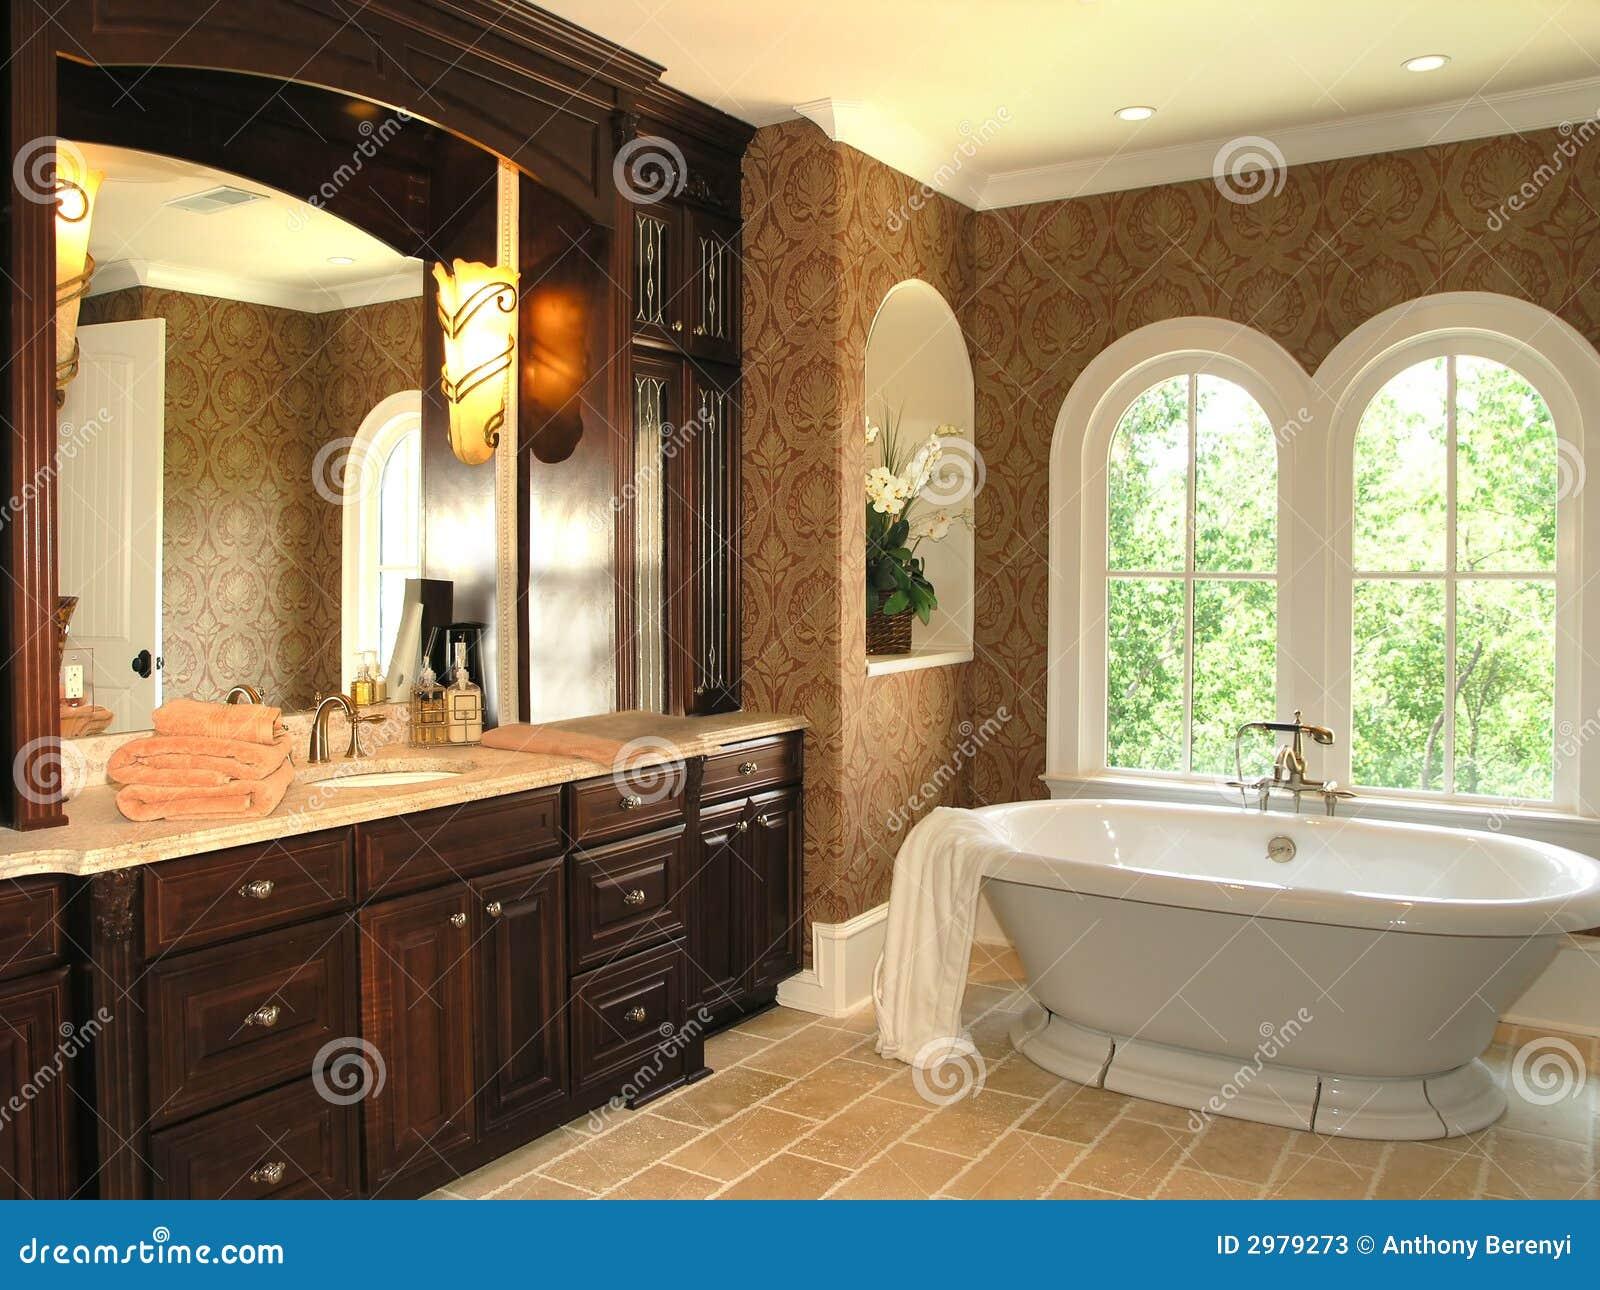 Accessori Da Bagno Di Lusso : Mobili da bagno di lusso full images of immagini di bagni moderni